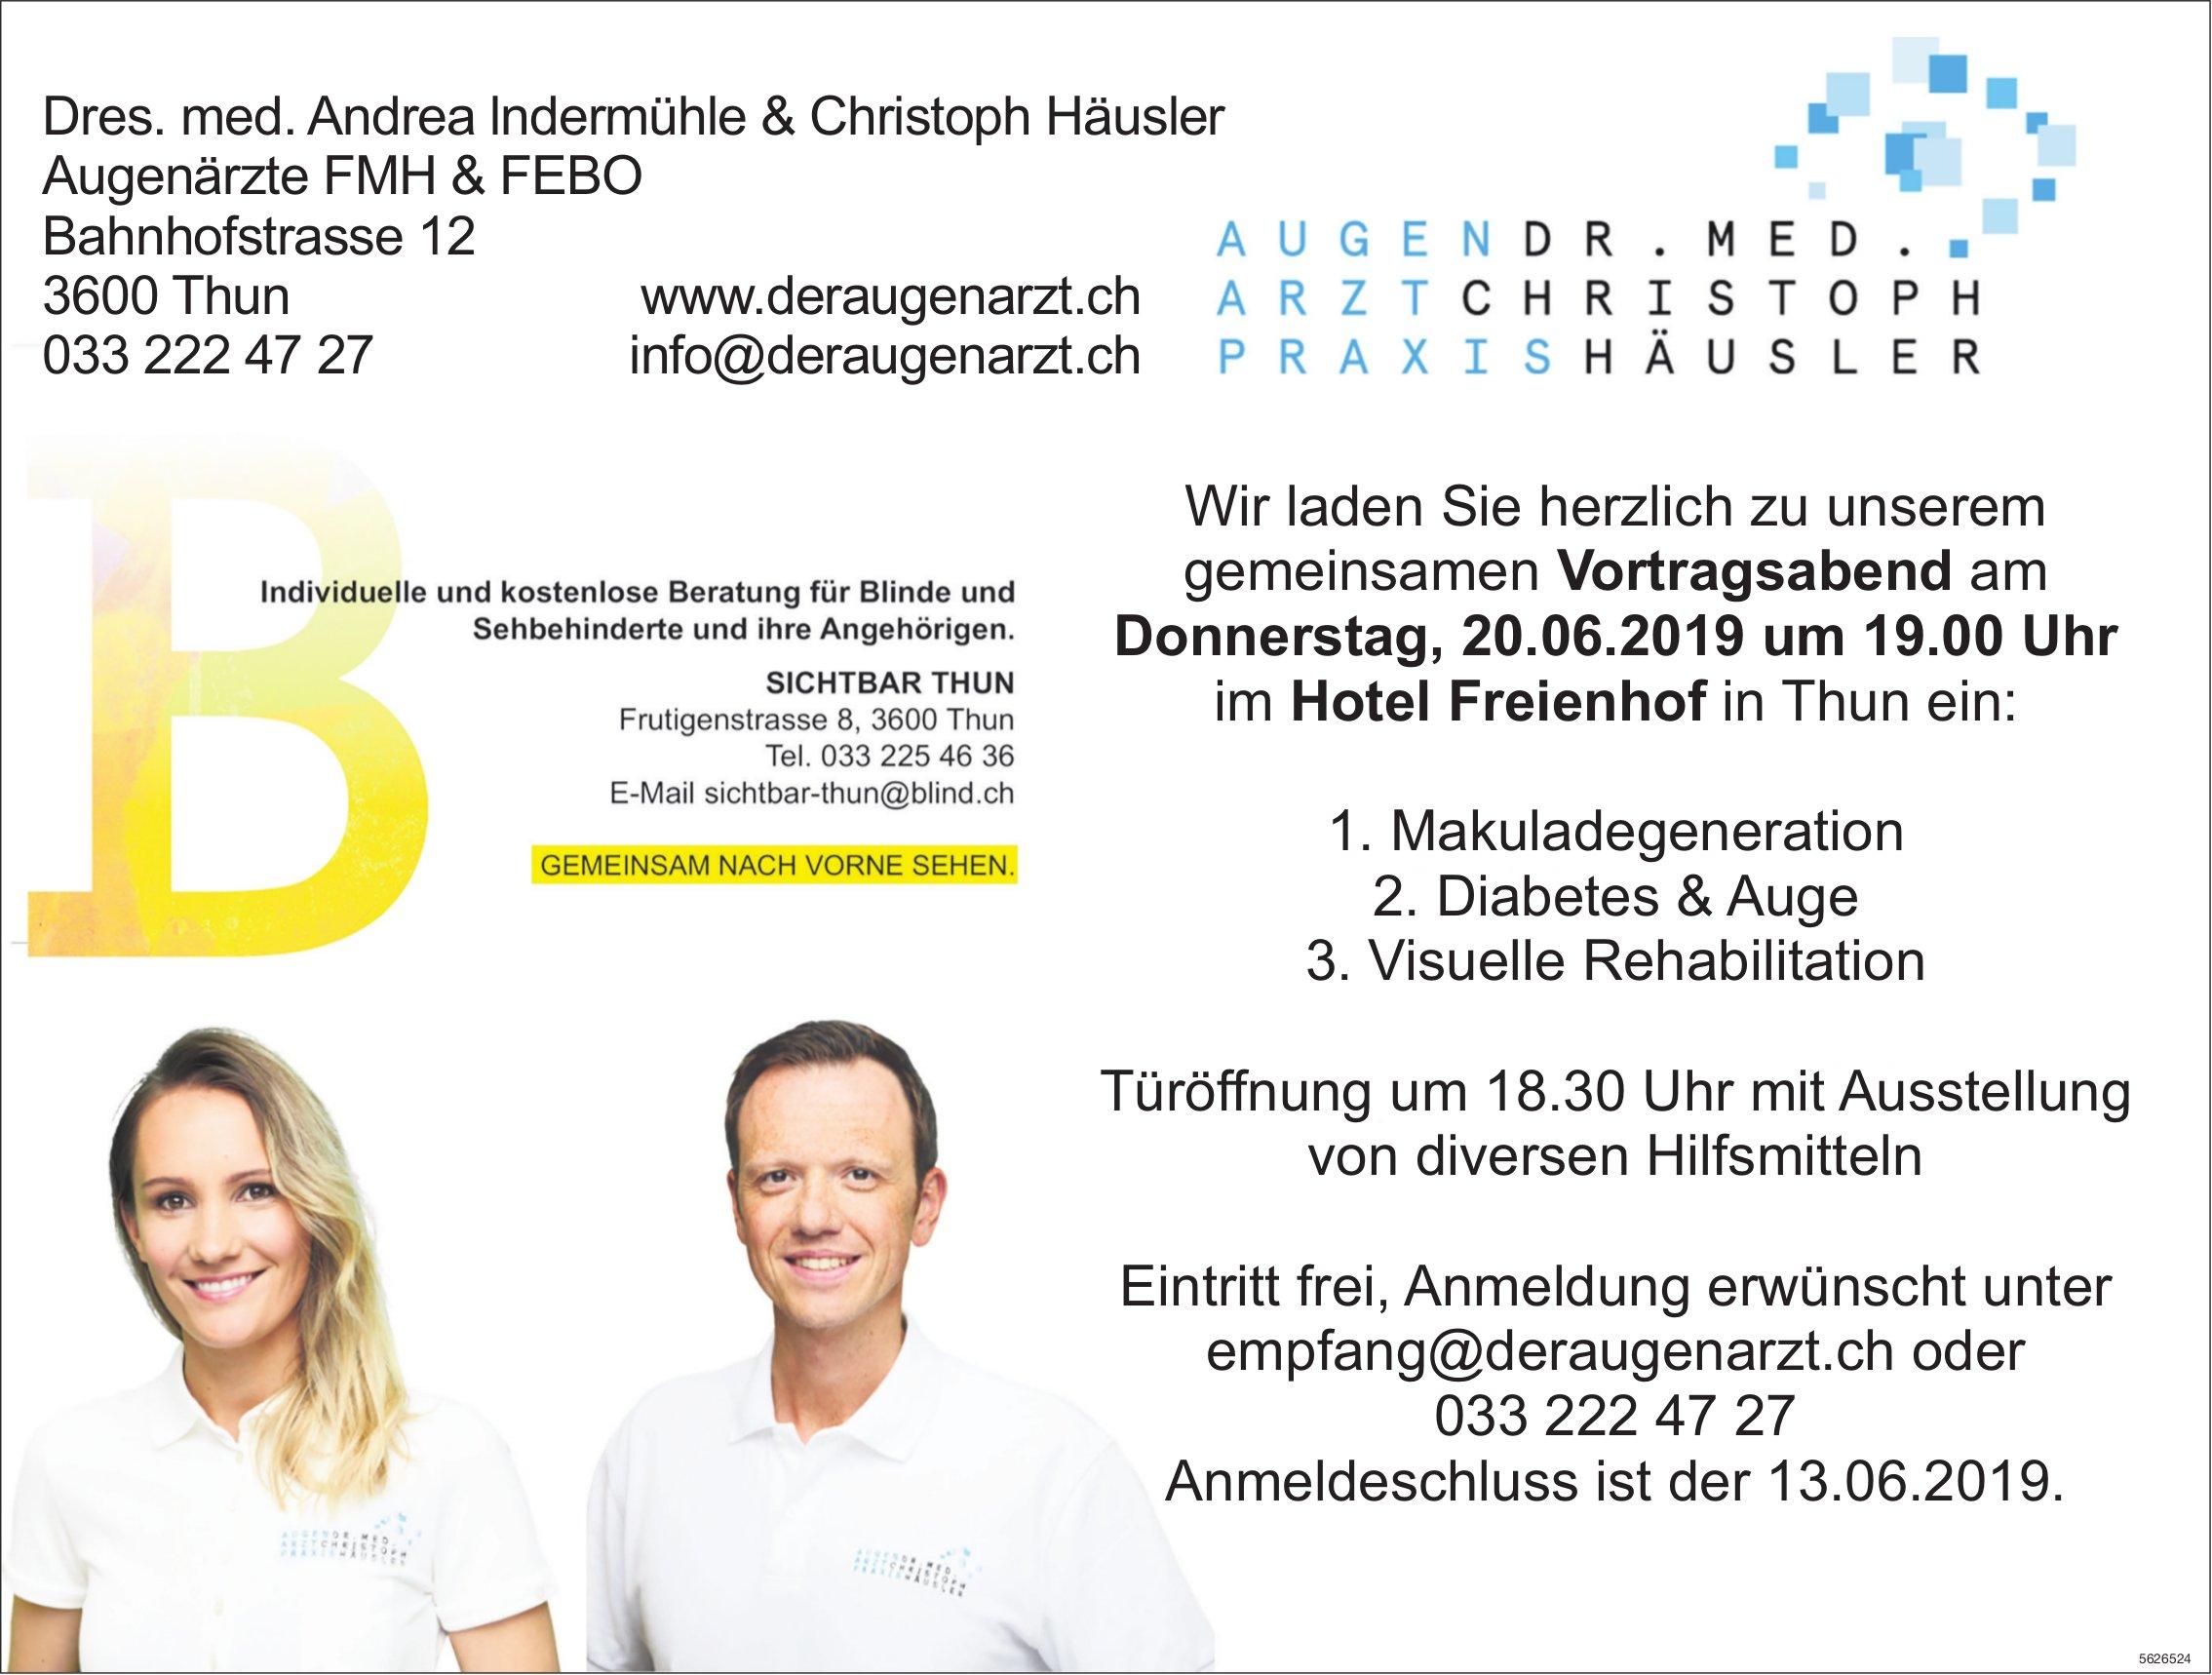 Vortragsabend - Makuladegeneration, Diabetes & Auge..., 20. Juni, Hotel Freienhof, Thun